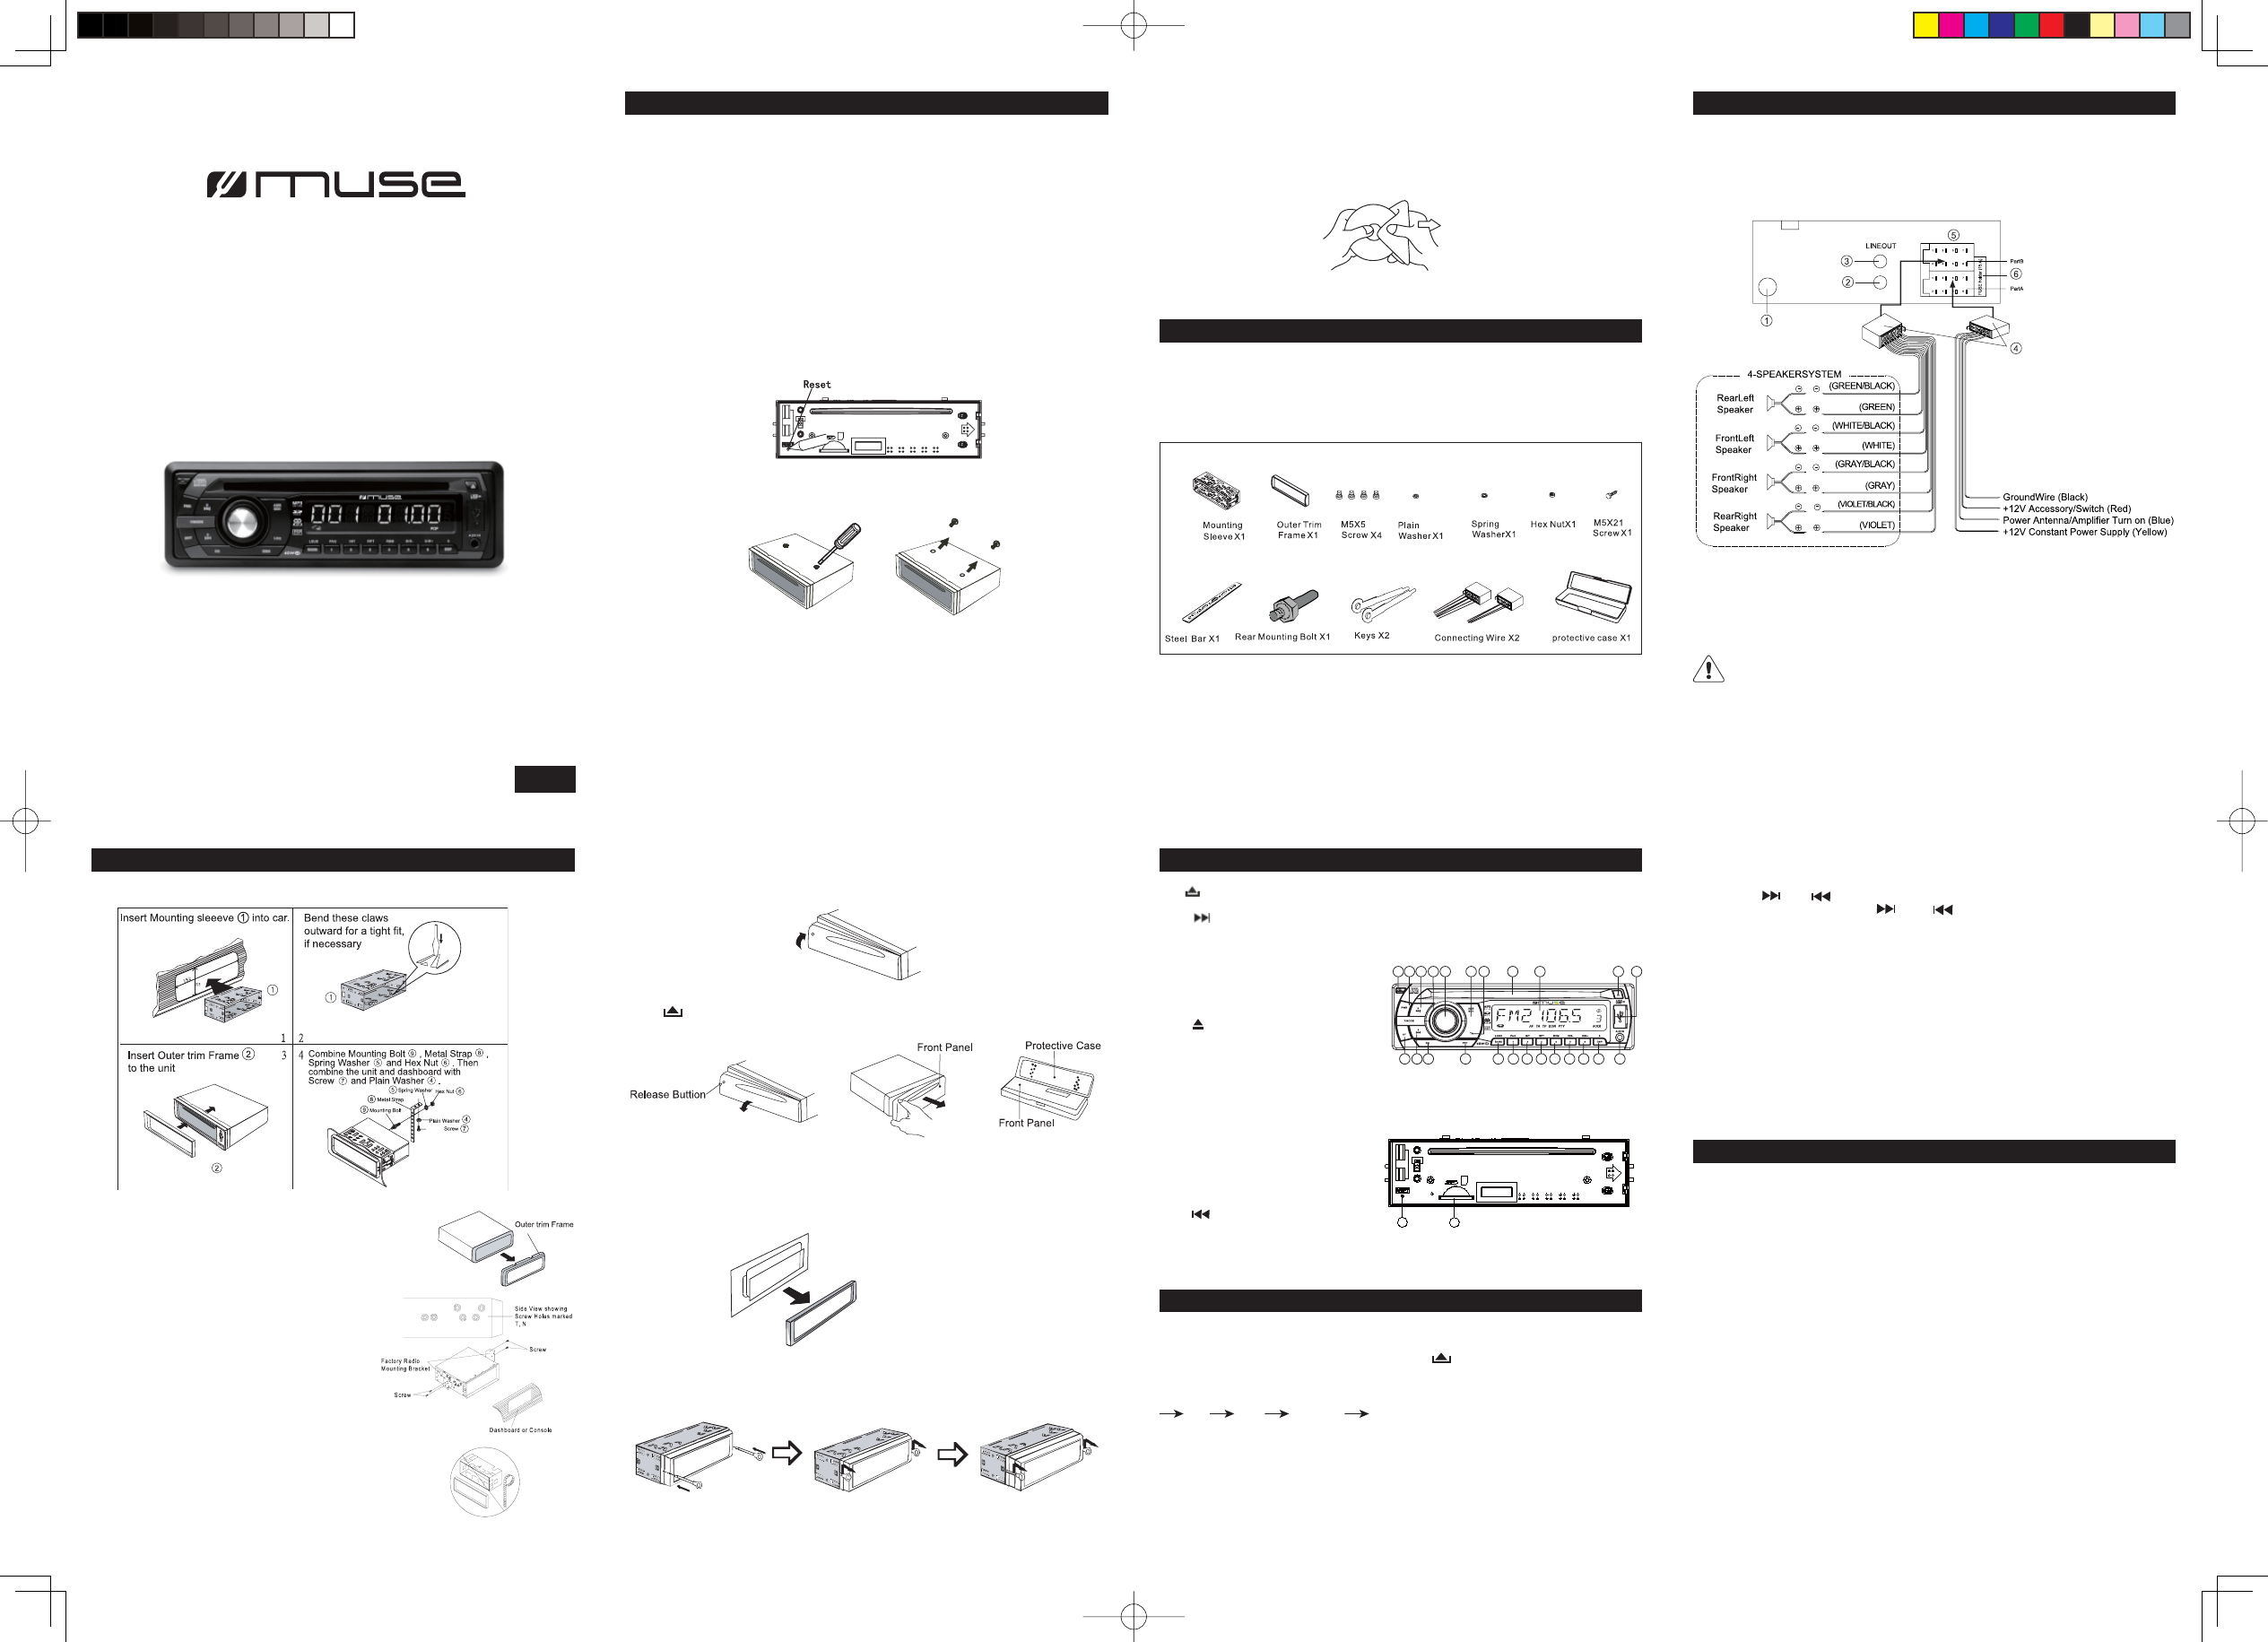 handleiding muse m 1015 pagina 1 van 2 english rh gebruikershandleiding com Schematic Diagram Schematic Circuit Diagram